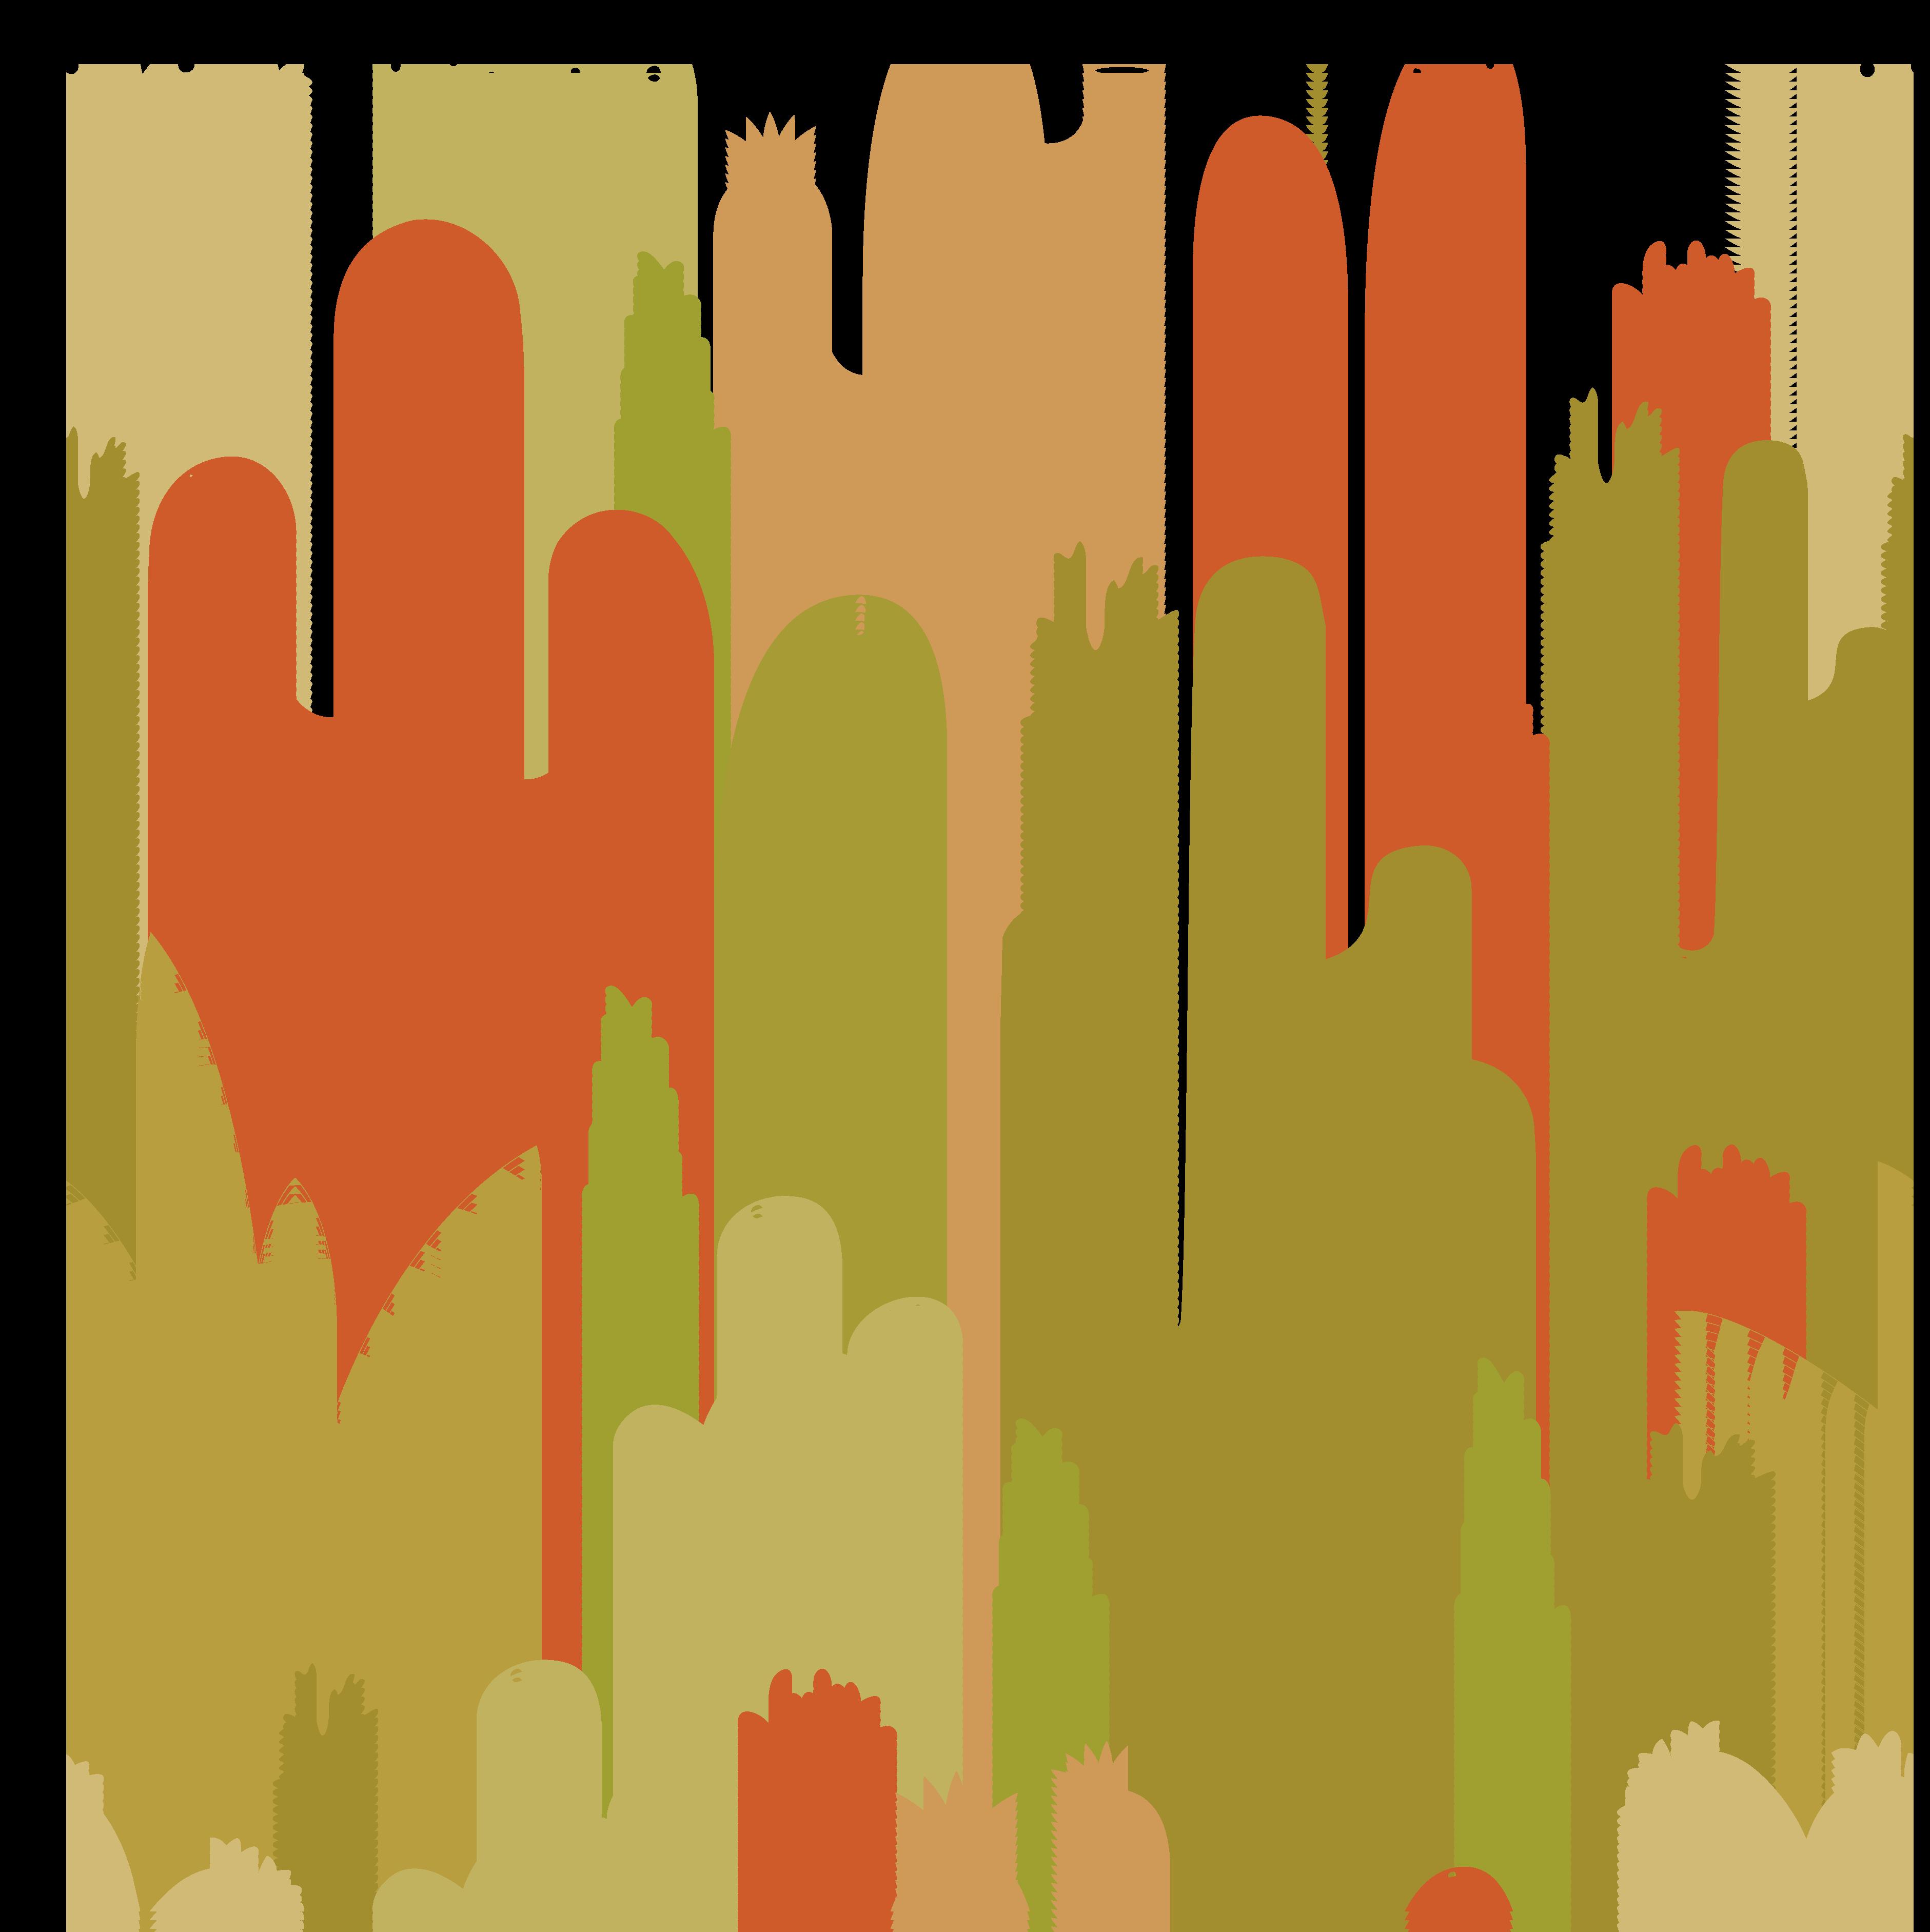 Cactaceae euclidean vector red. Clipart banner cactus